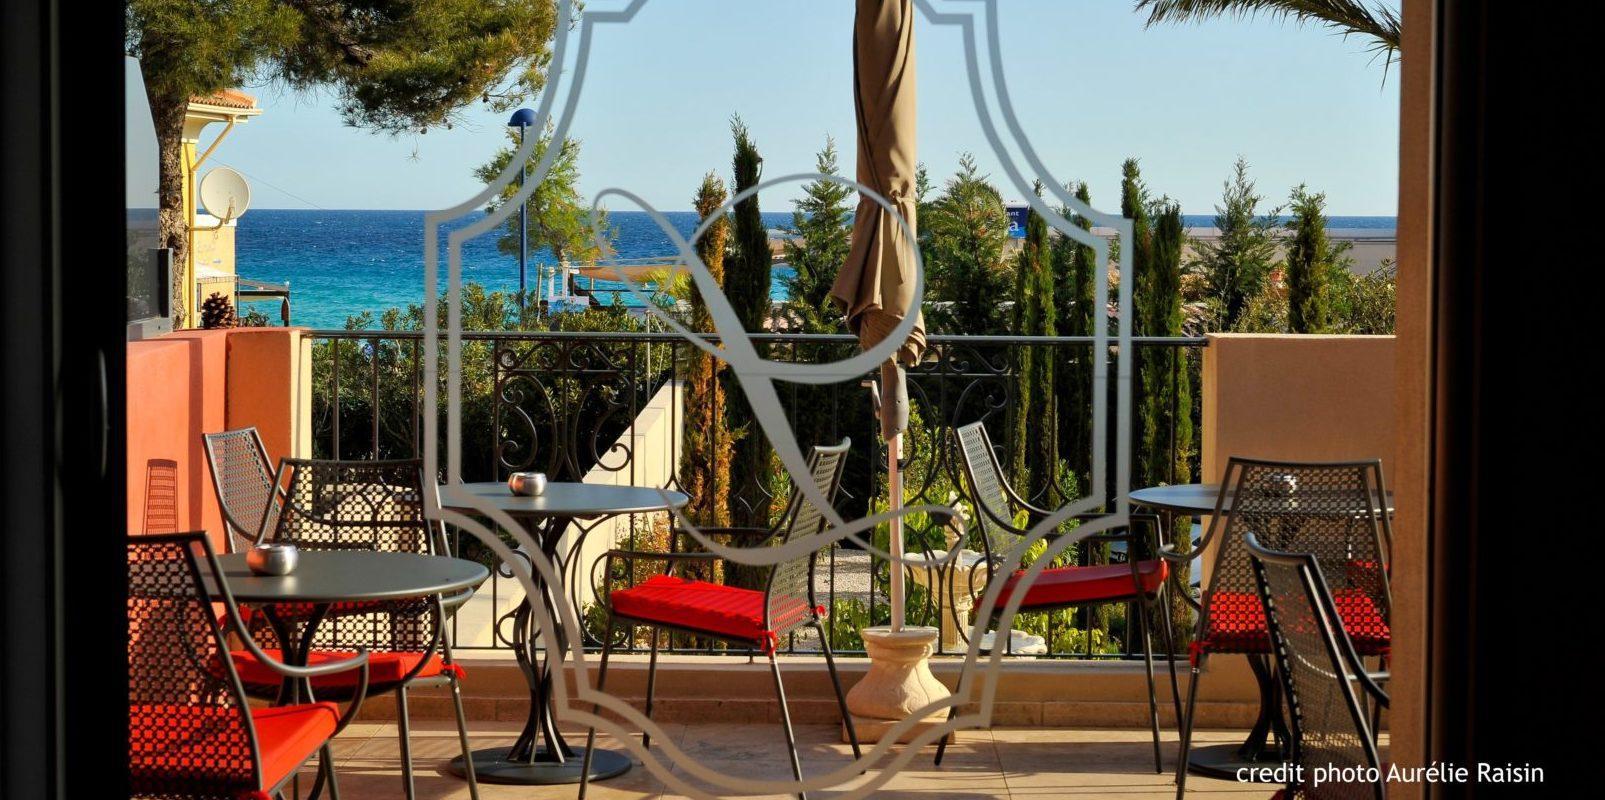 Boutique Hotel Liberata Ile Rousse Balagne Corsica Frankrijk terras zitjes zeezicht uitgezoomd